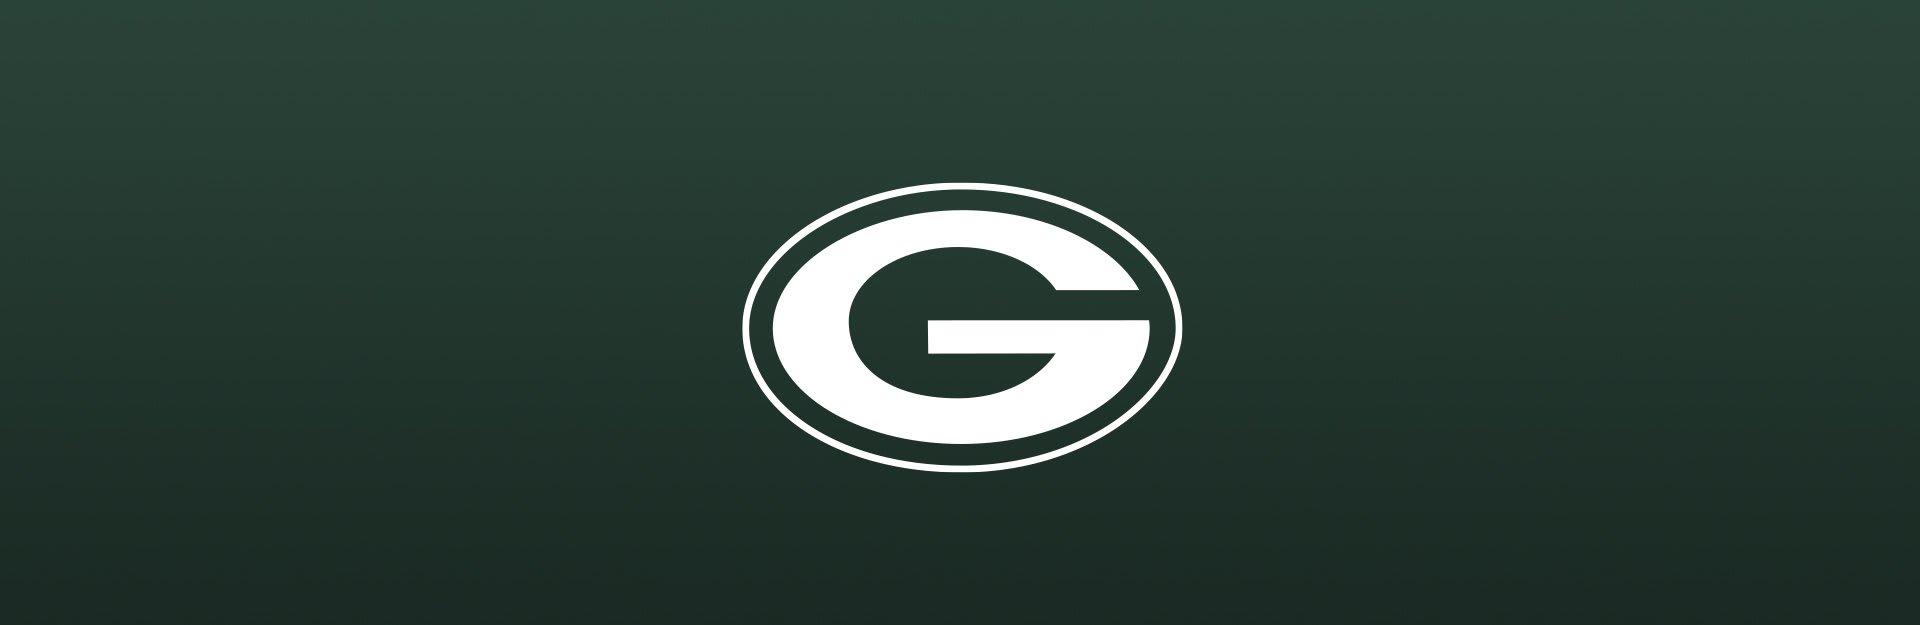 Green Bay Packers logo overlaid on dark green background